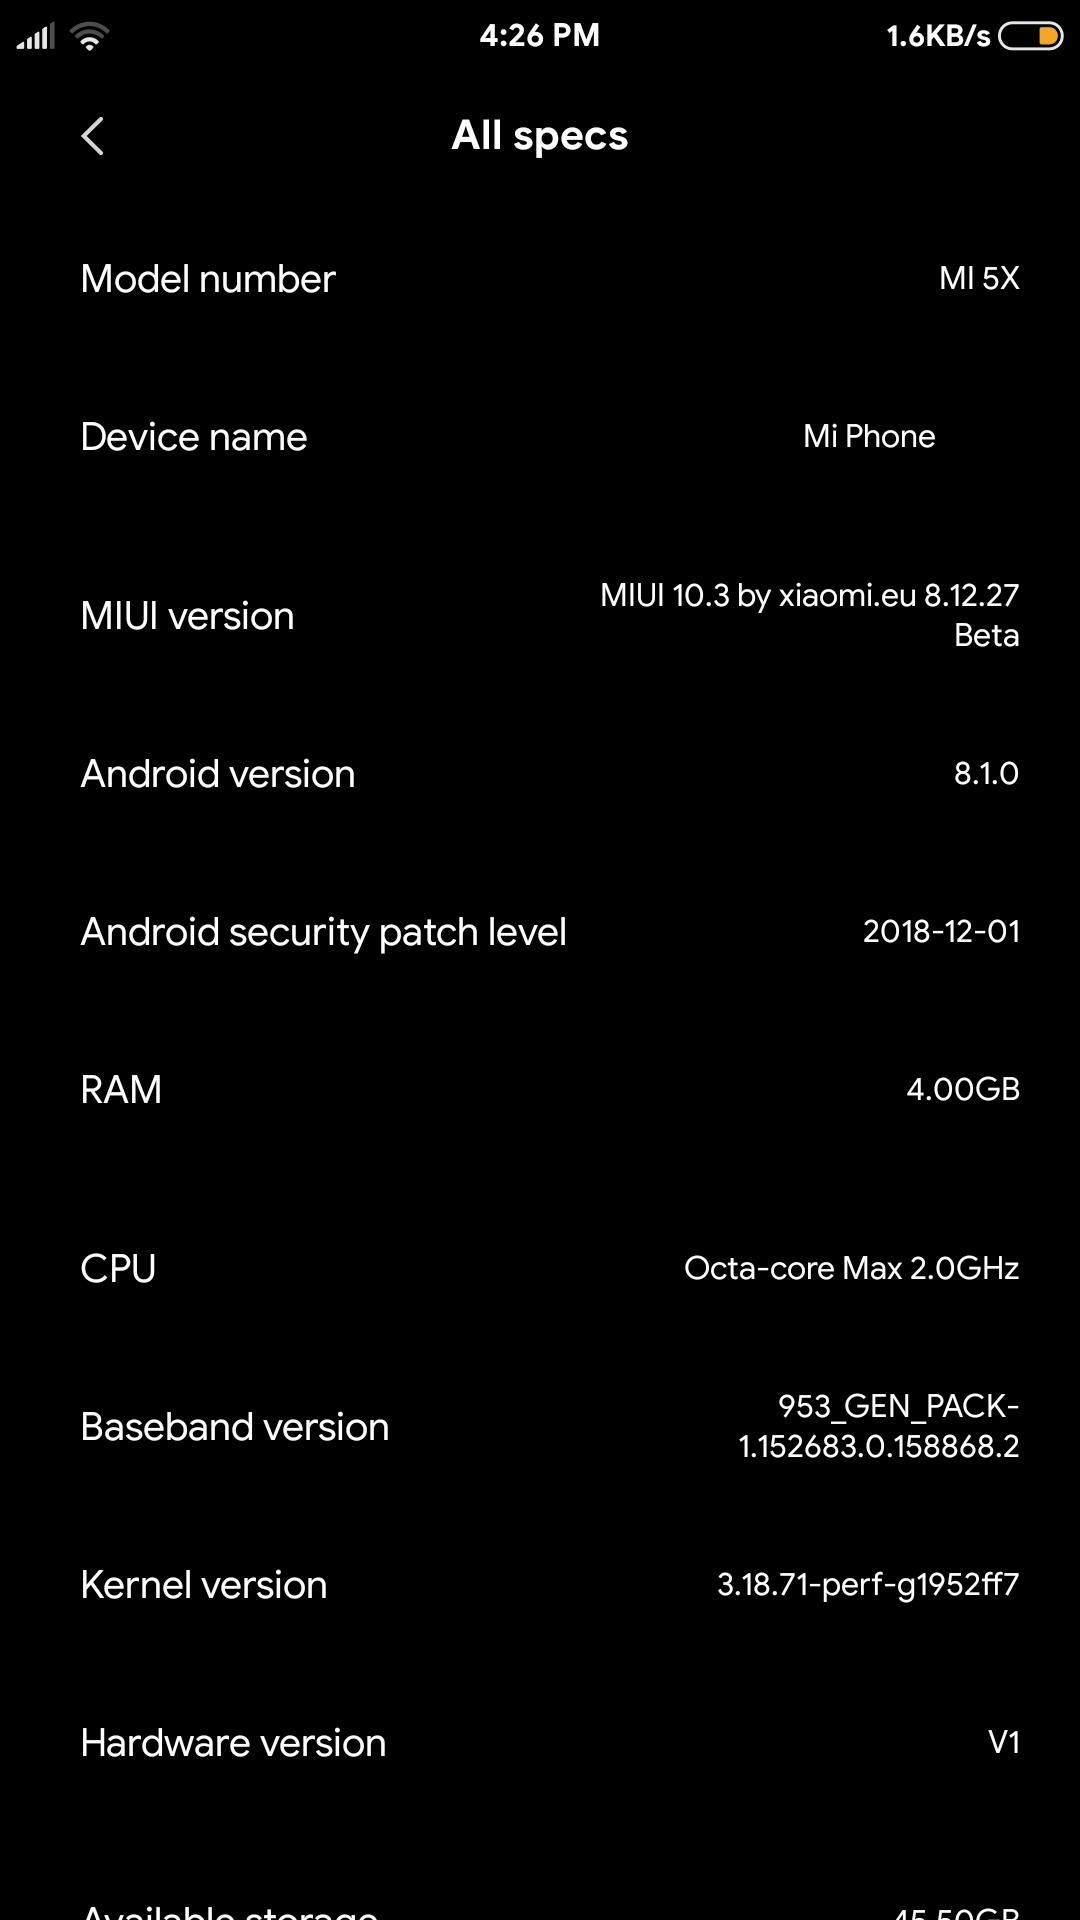 Screenshot_2019-01-04-16-26-36-200_com.android.settings.png